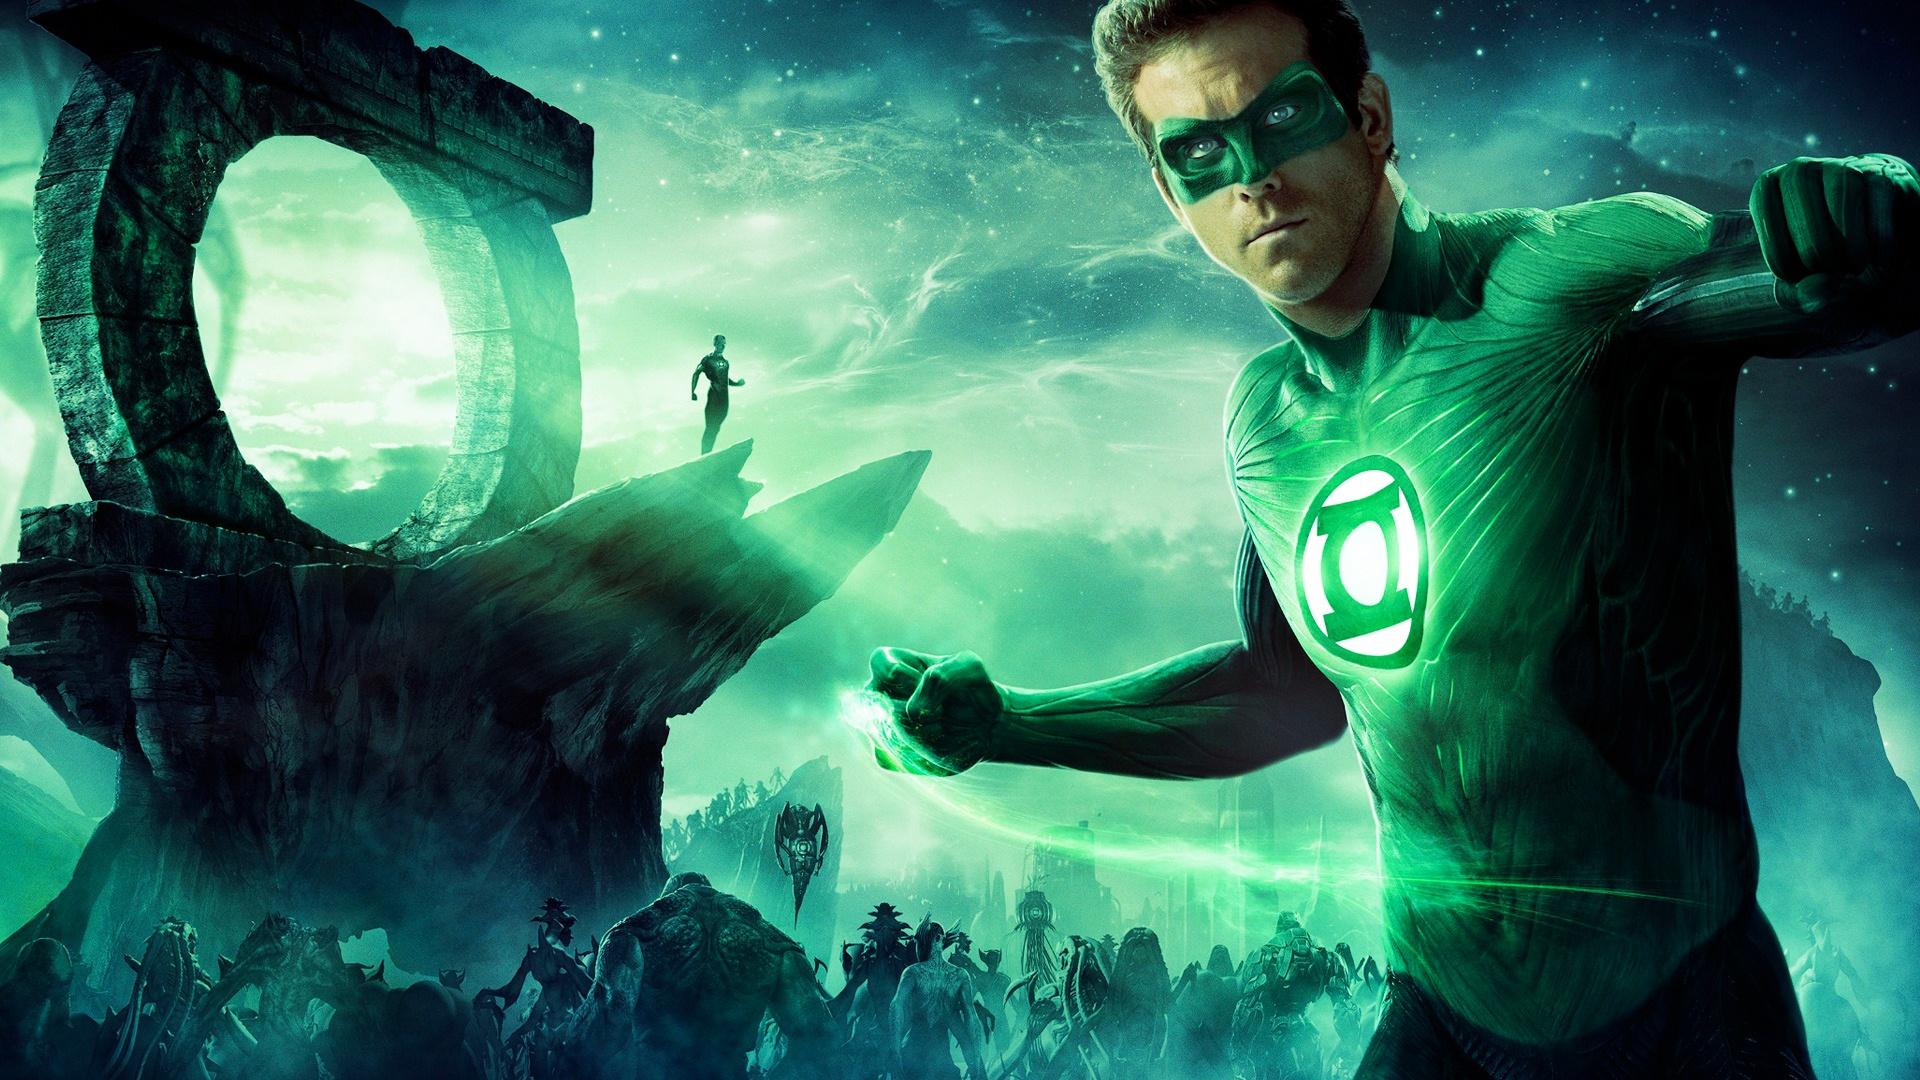 Green Lantern 2011 Movie Wallpapers HD Wallpapers 1920x1080